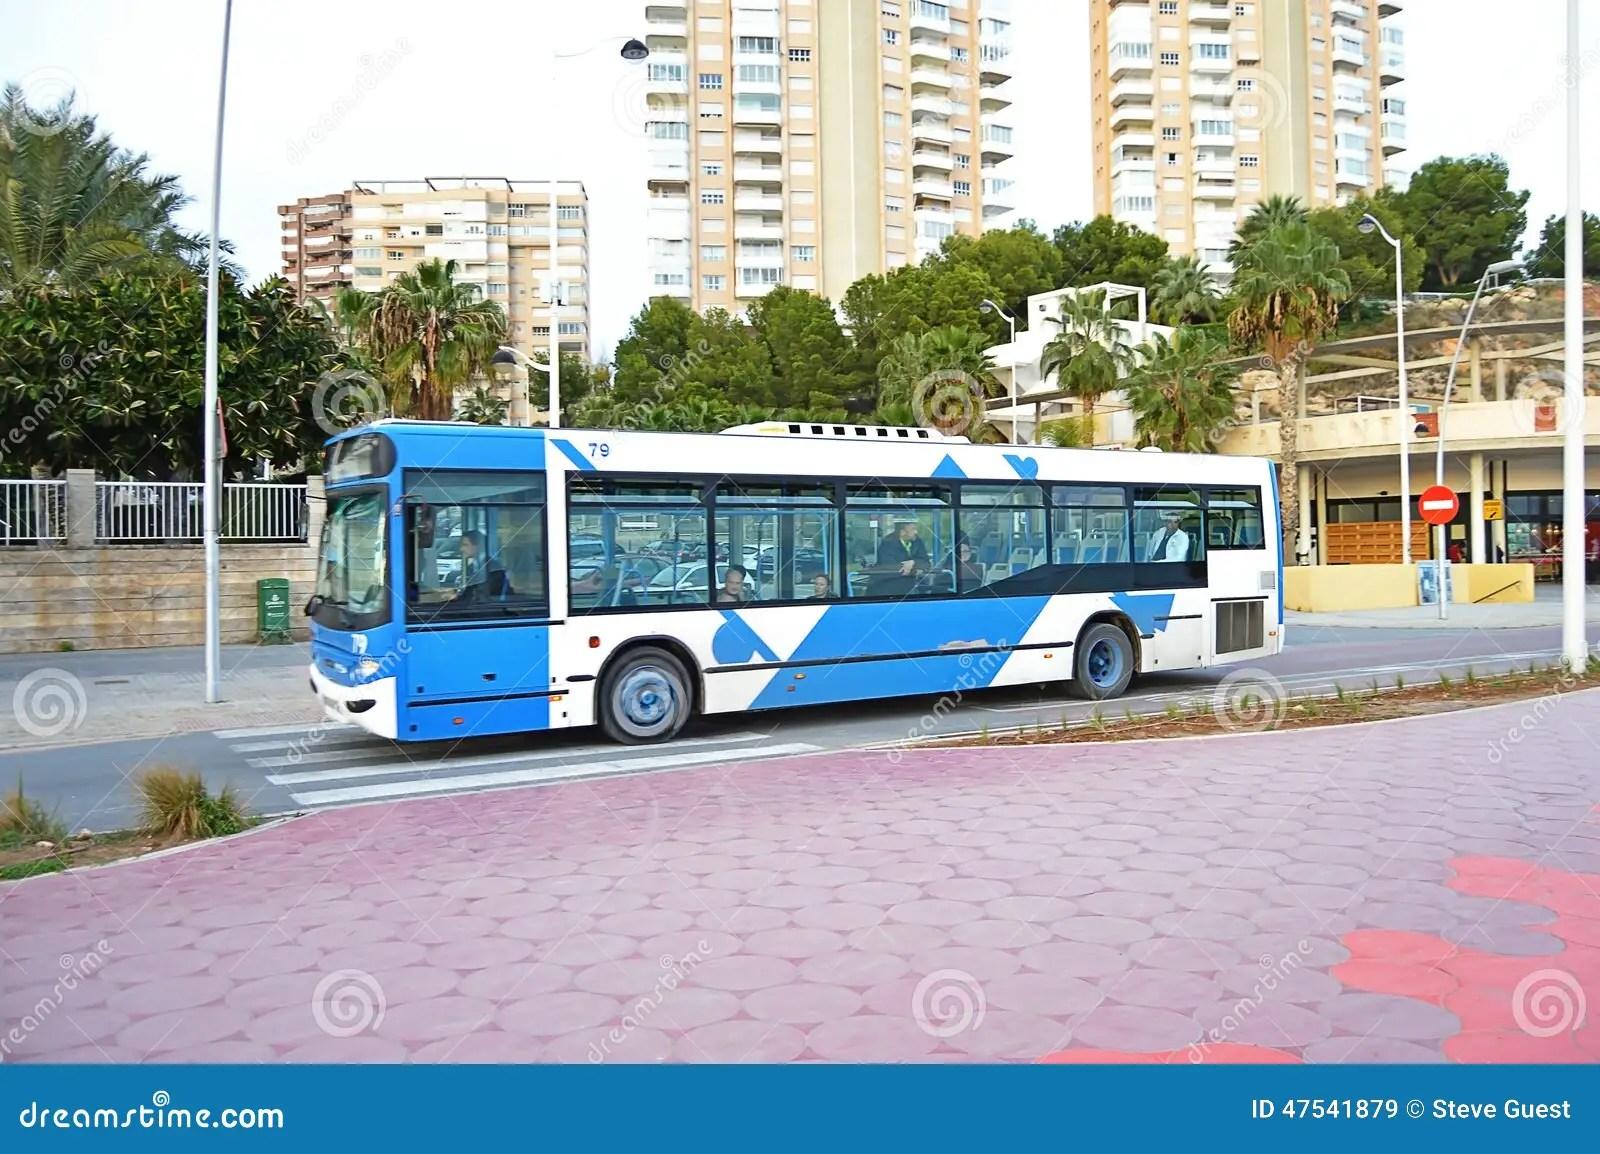 A Local Bus Benidorm Coach editorial stock image. Image of pass - 47541879